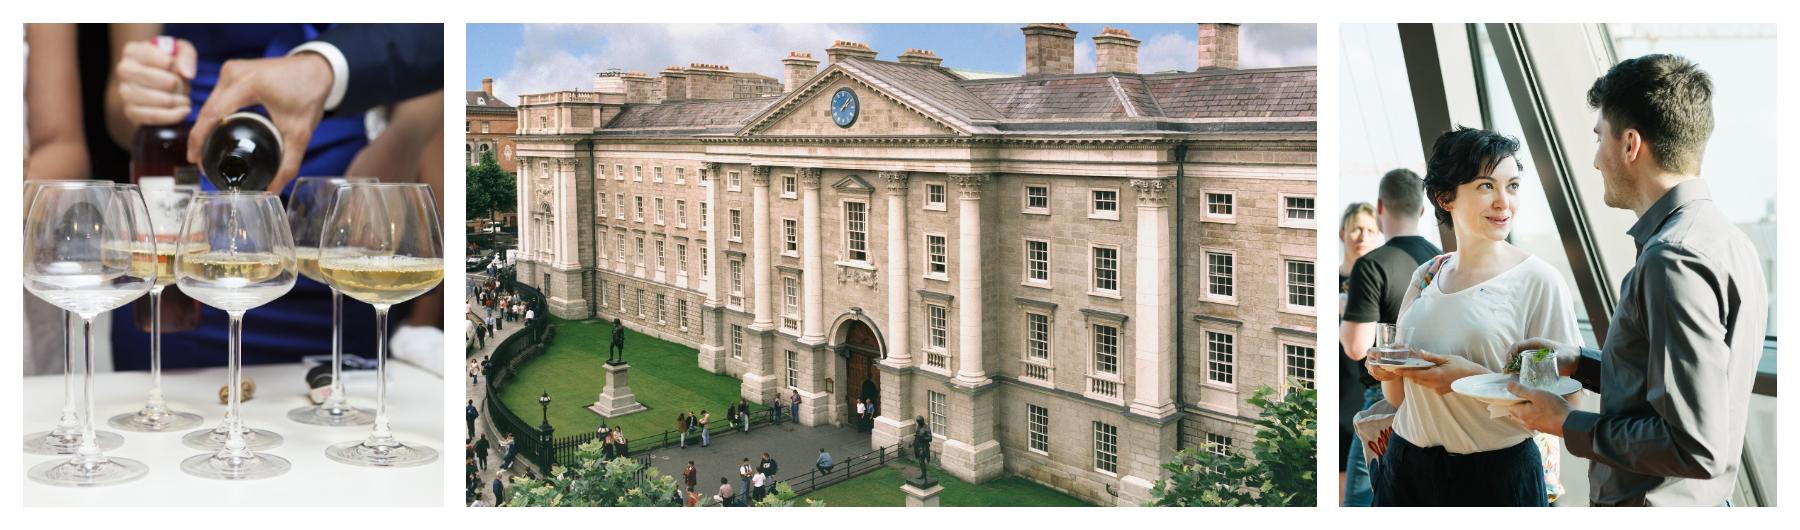 Northern Ireland Alumni Networking & Drinks Reception